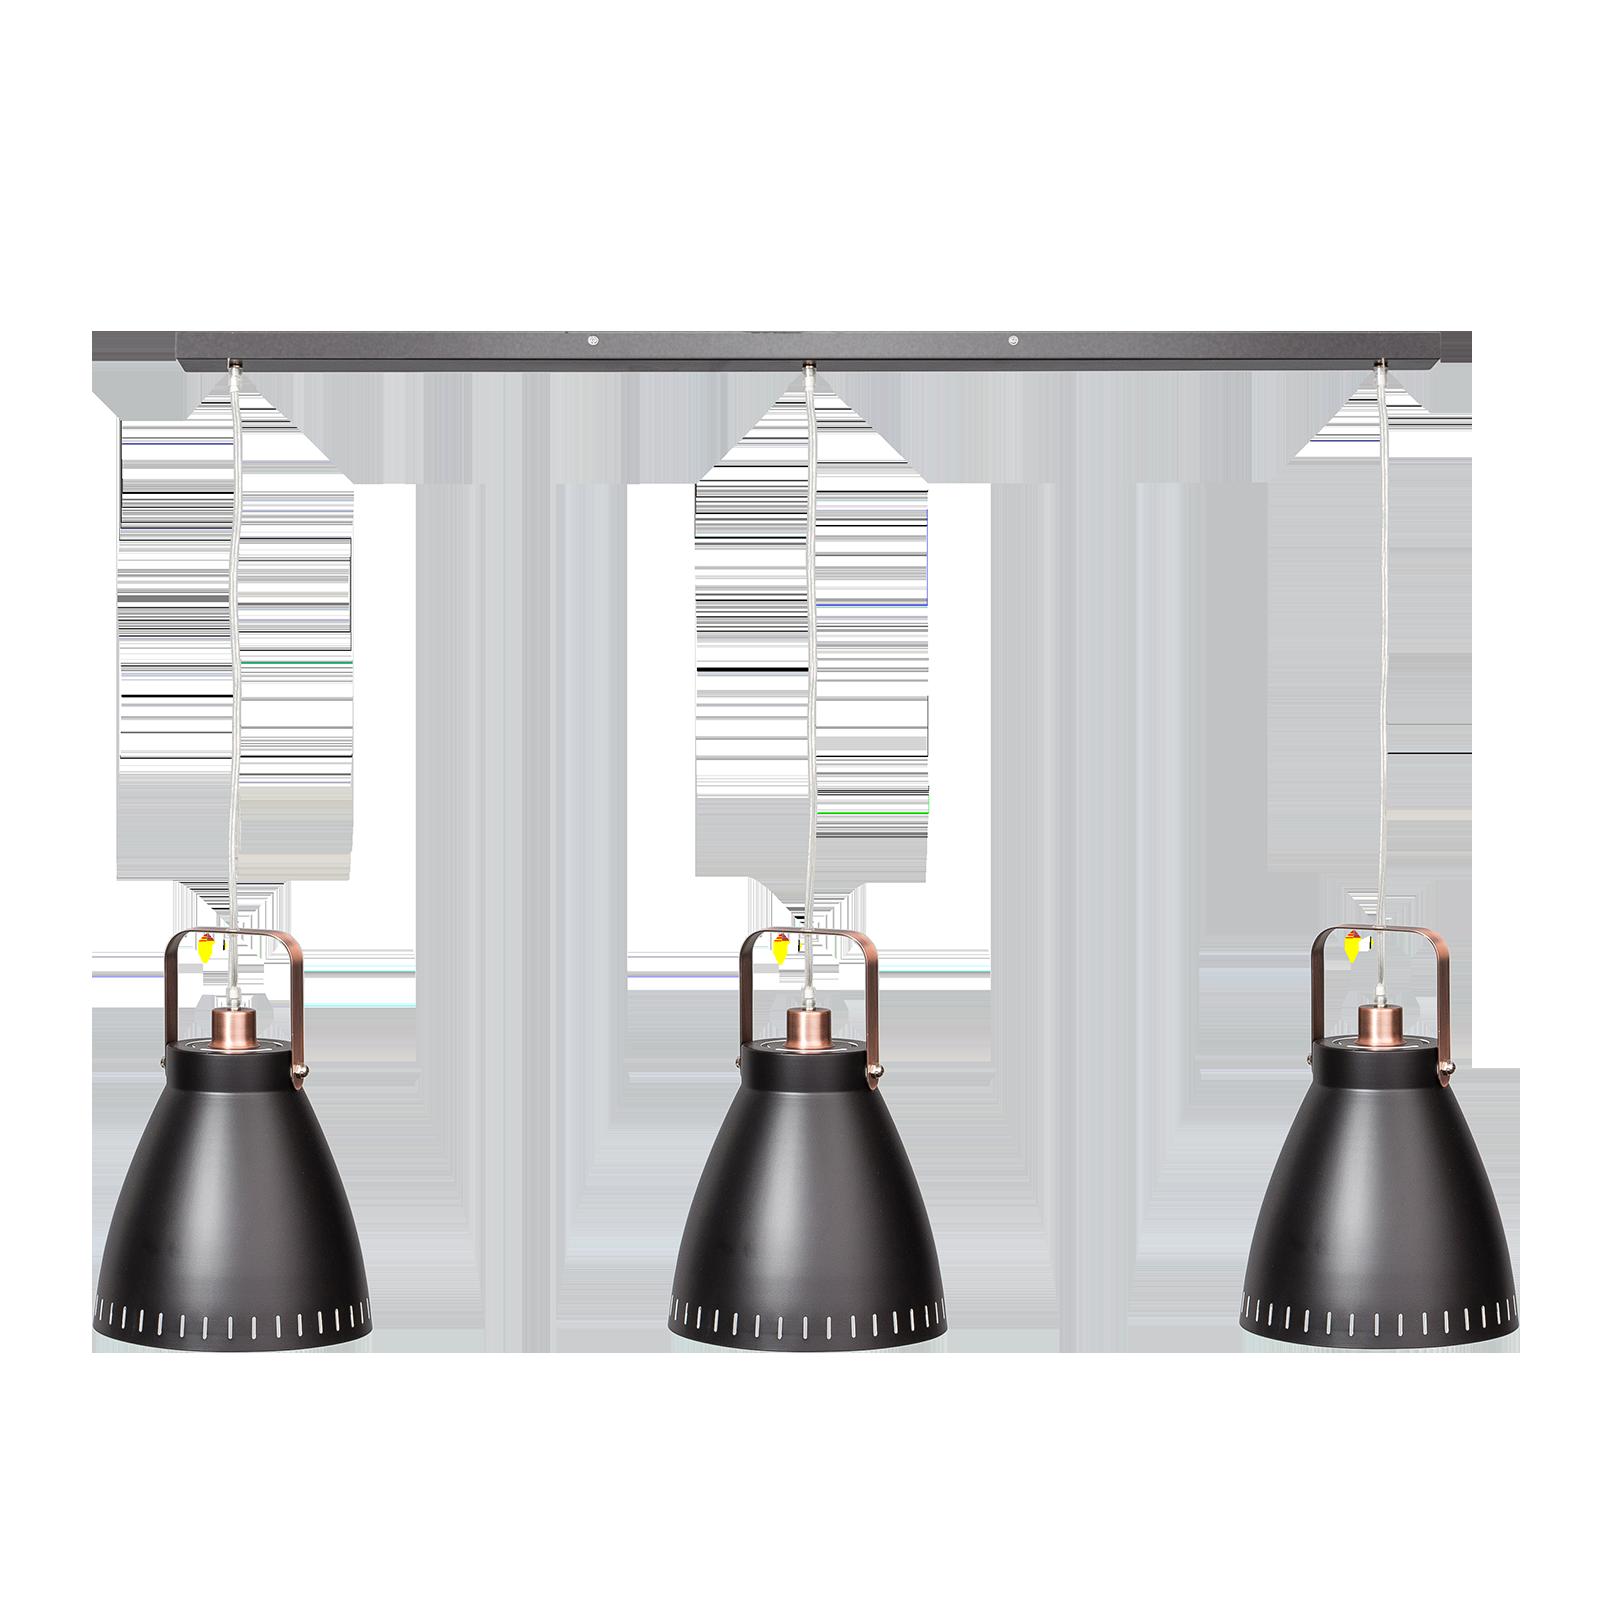 Acate hanglamp ETH koper - zwart